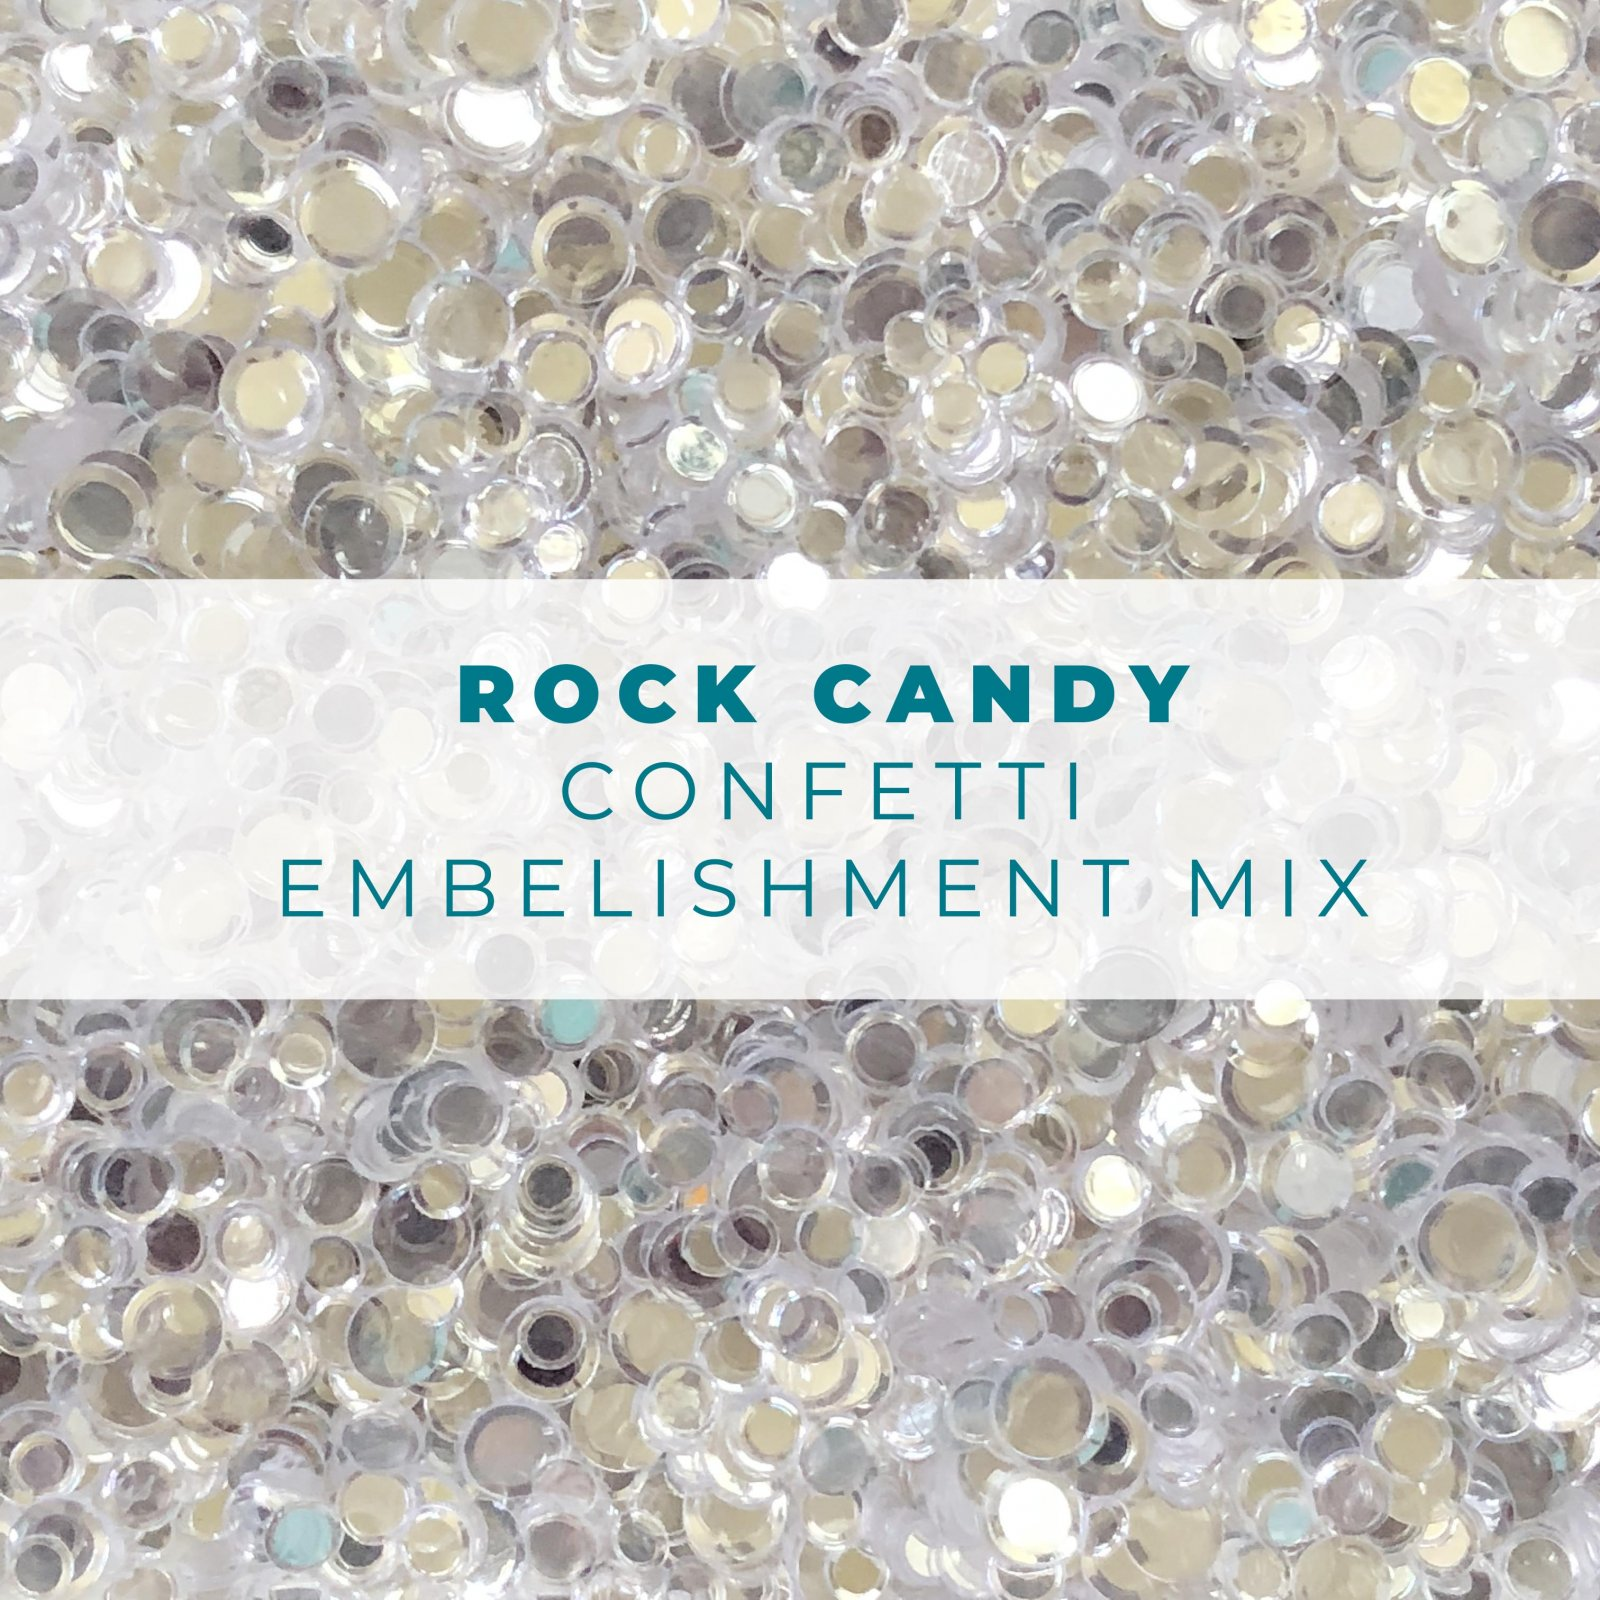 Rock Candy Confetti Embellishment Mix